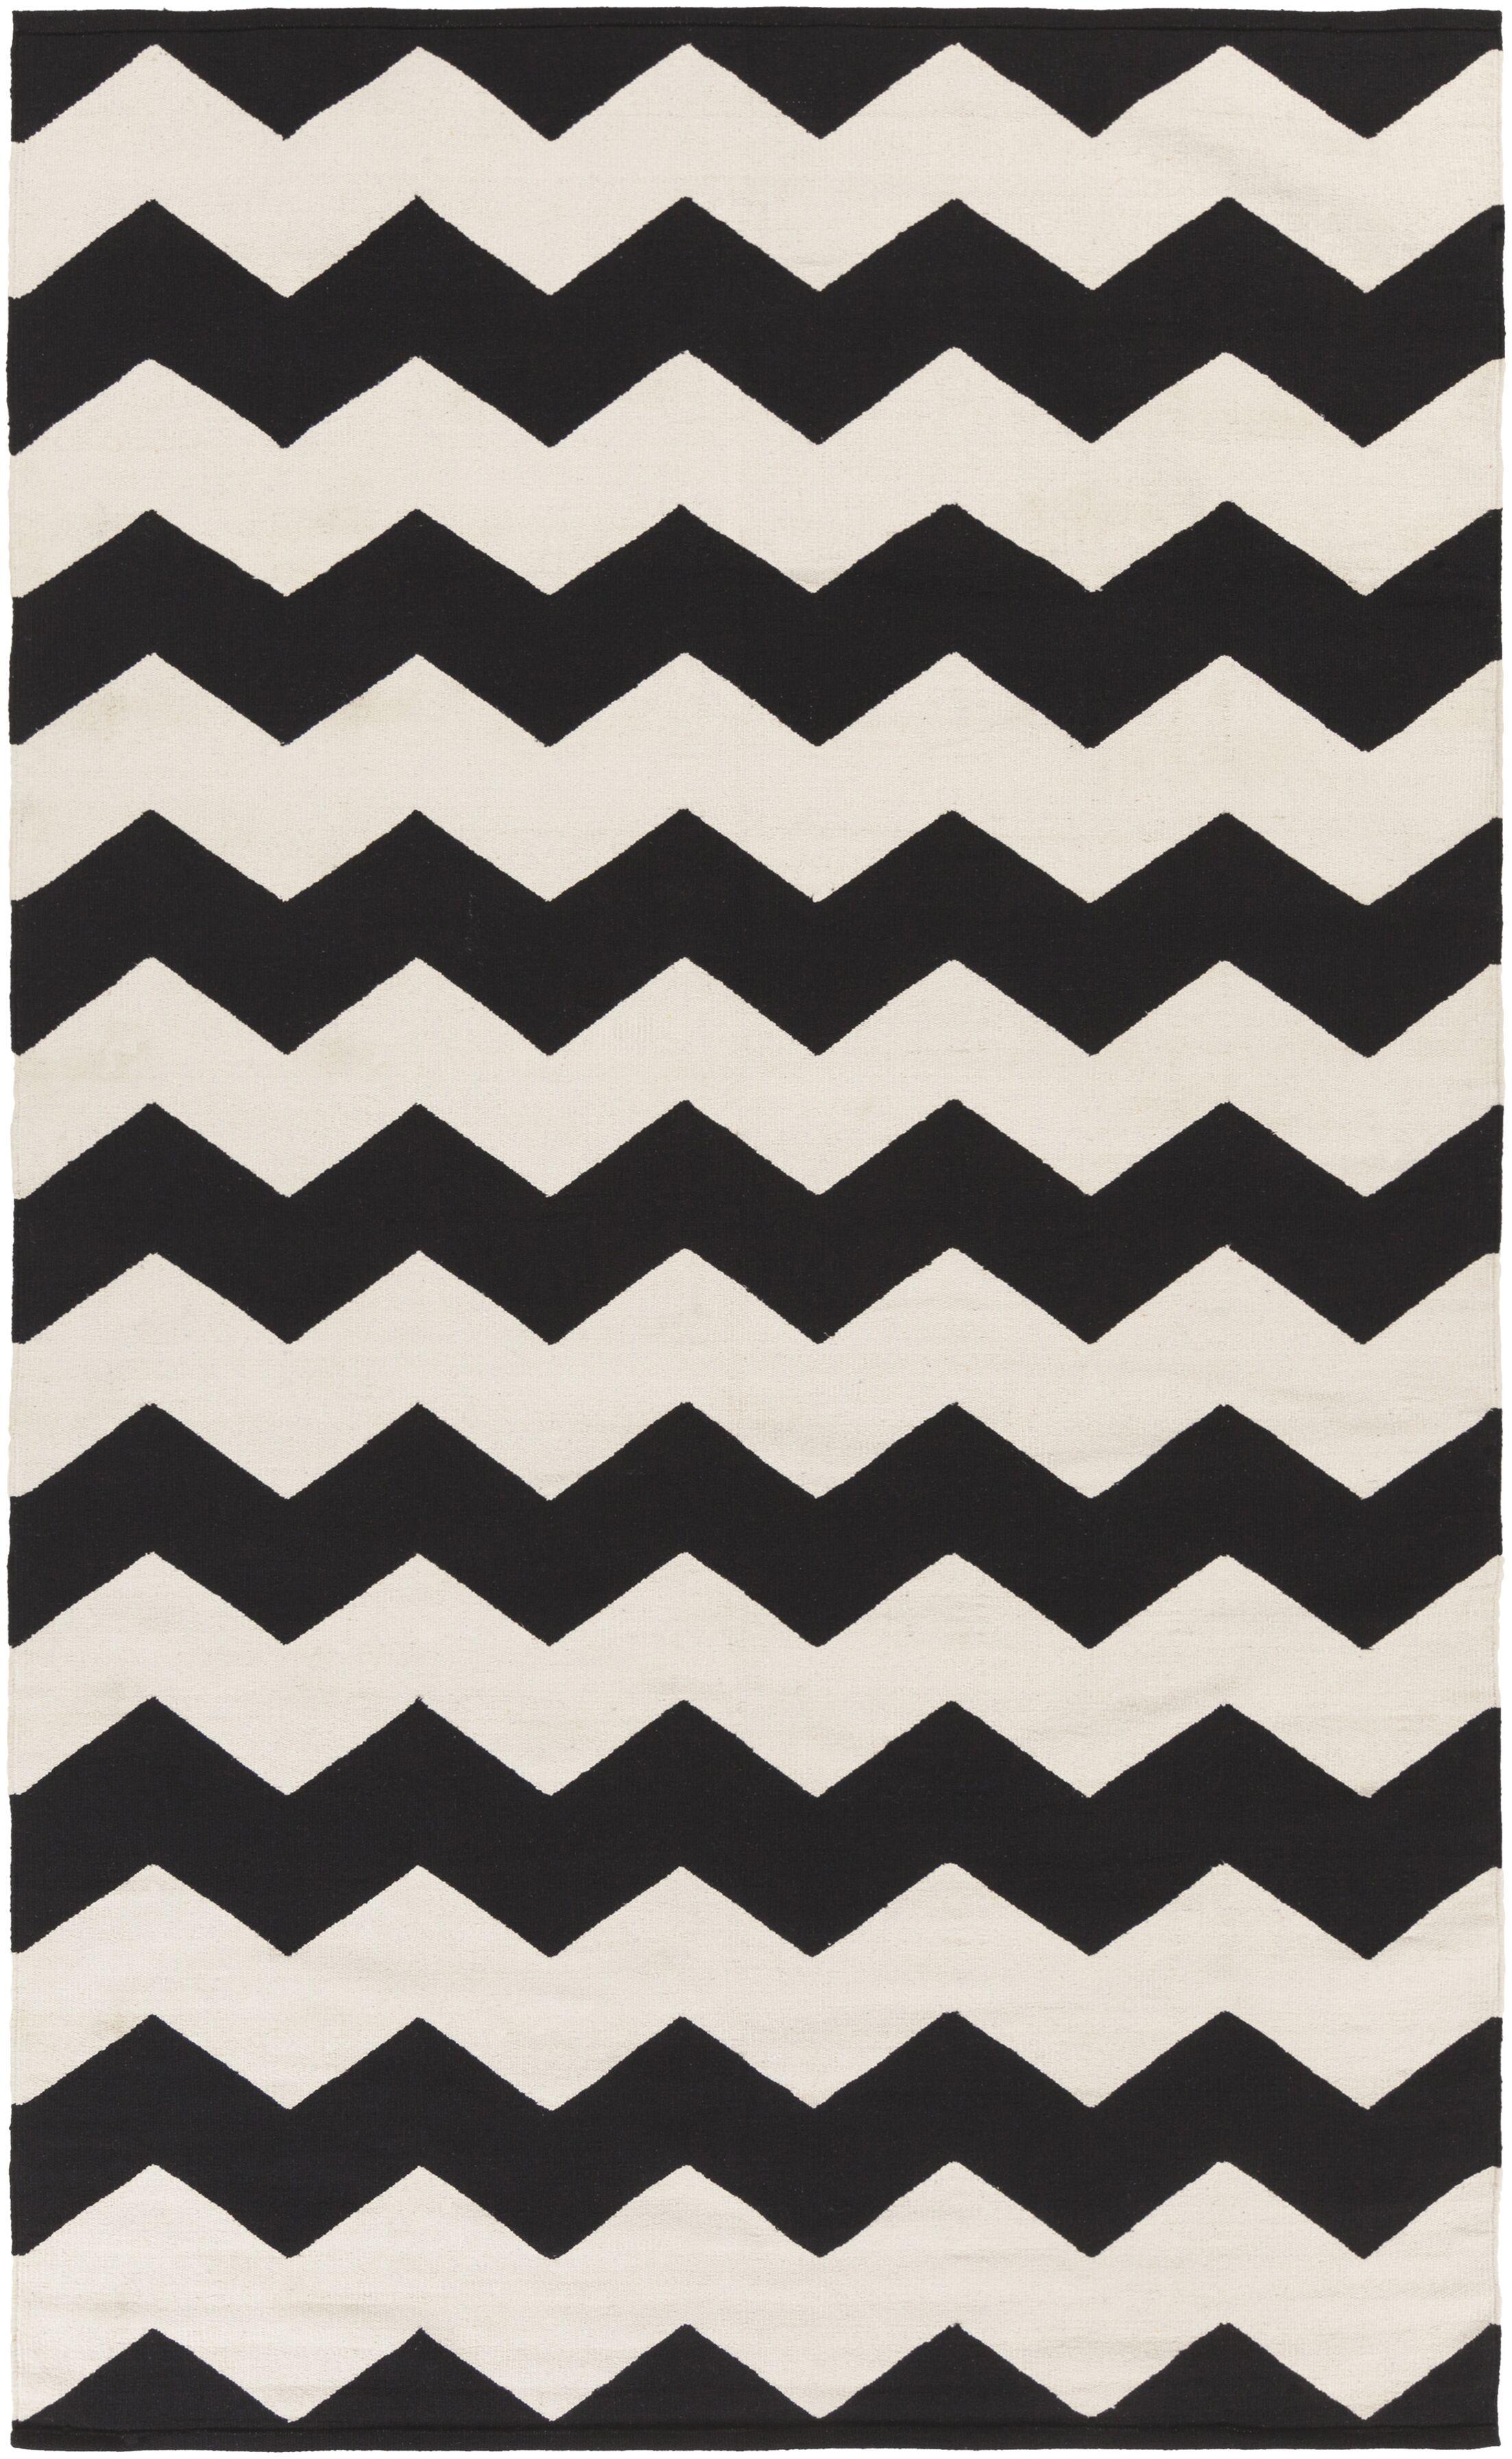 Murguia Black Chevron Area Rug Rug Size: Rectangle 9' x 12'